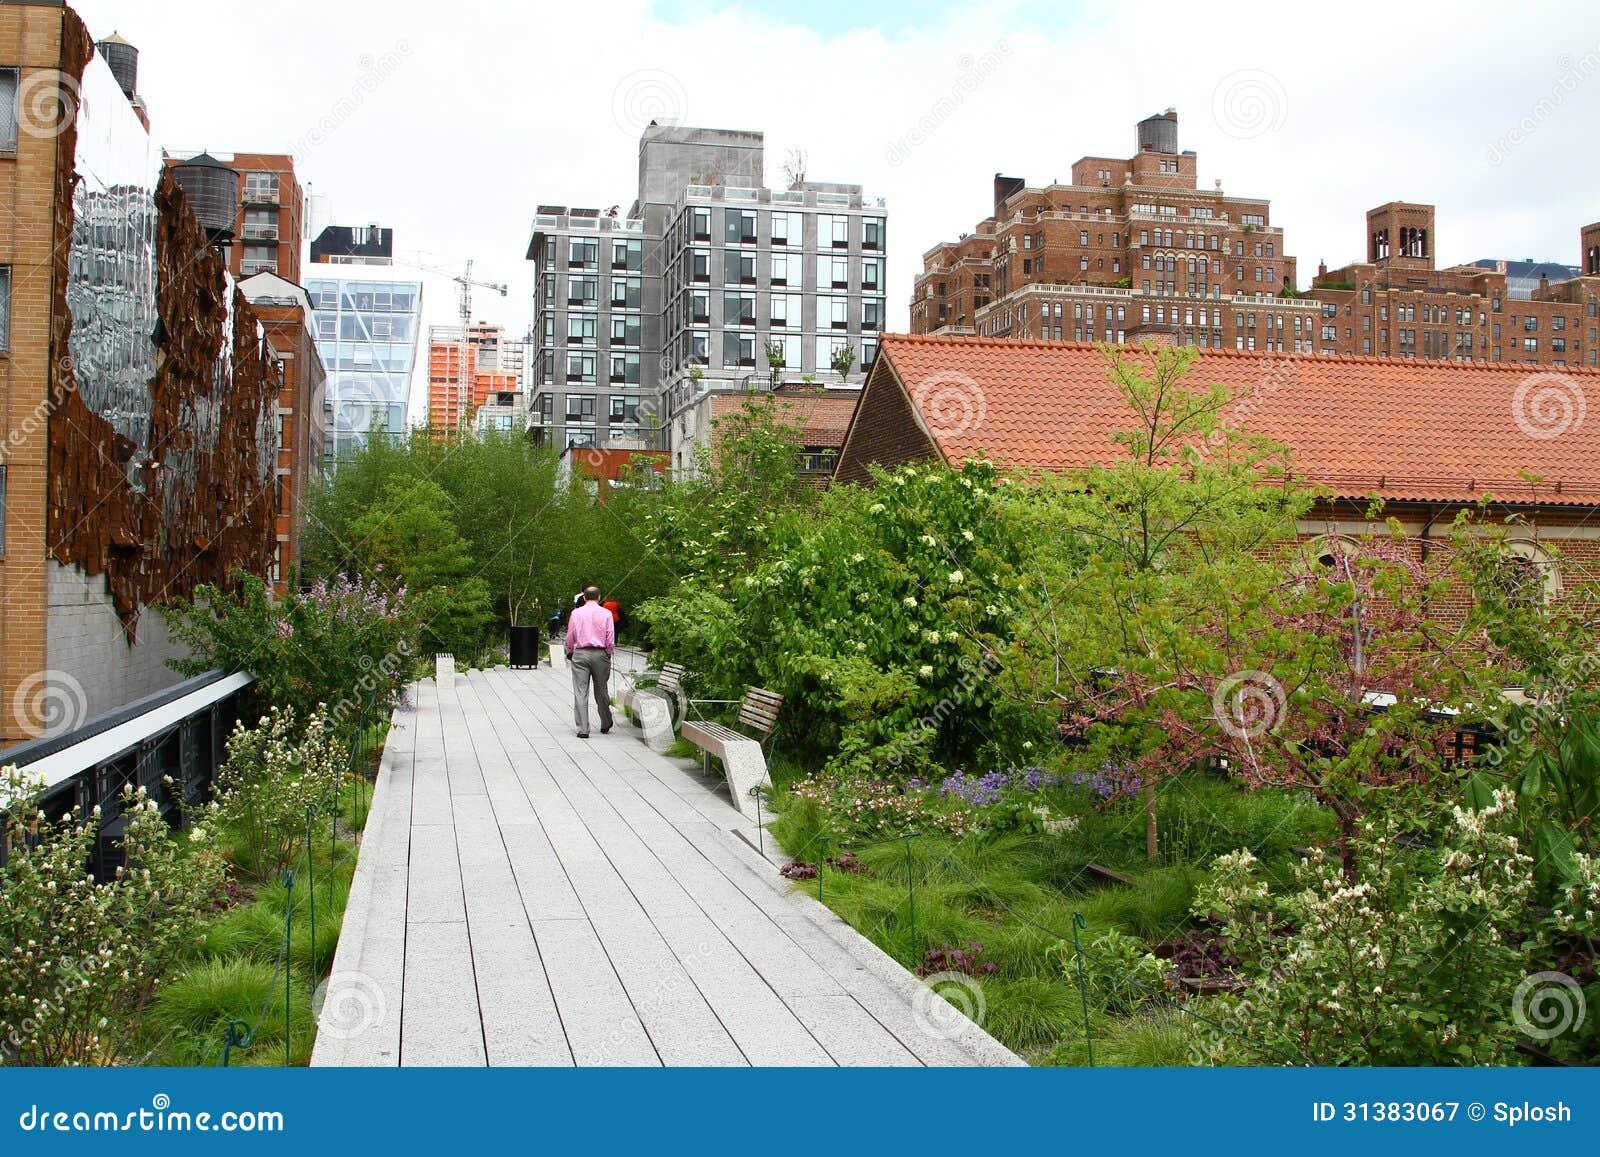 Image Result For Garden New York Railway